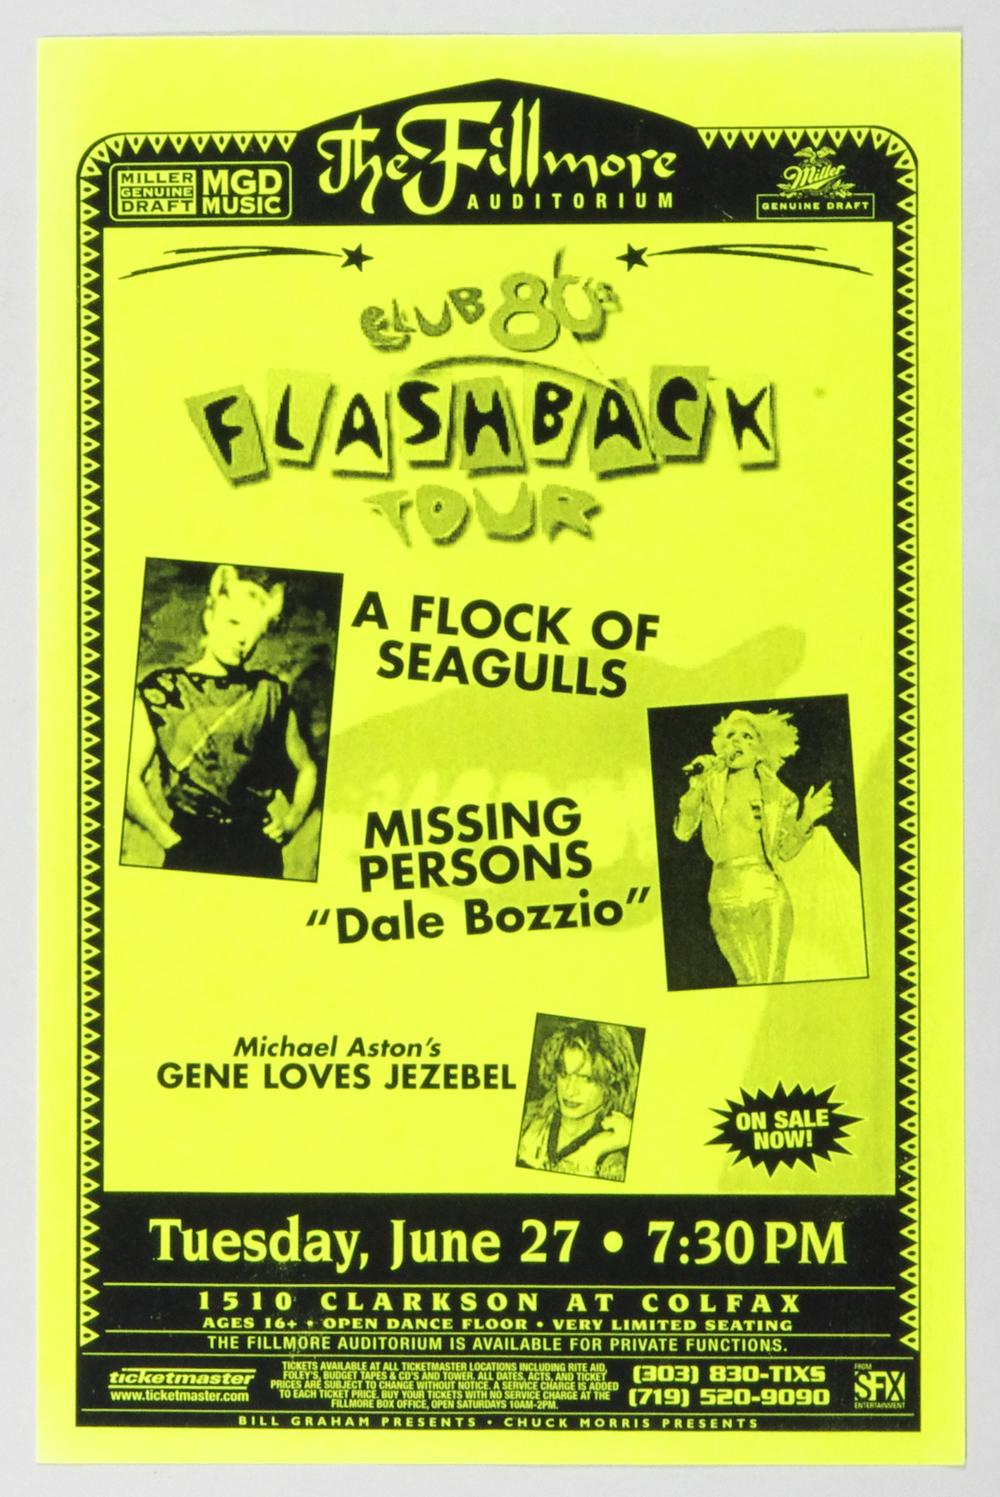 A Flock Of Seagulls Poster 2001 Jun 27 Club 80's Flashback Tour Fillmore Denver